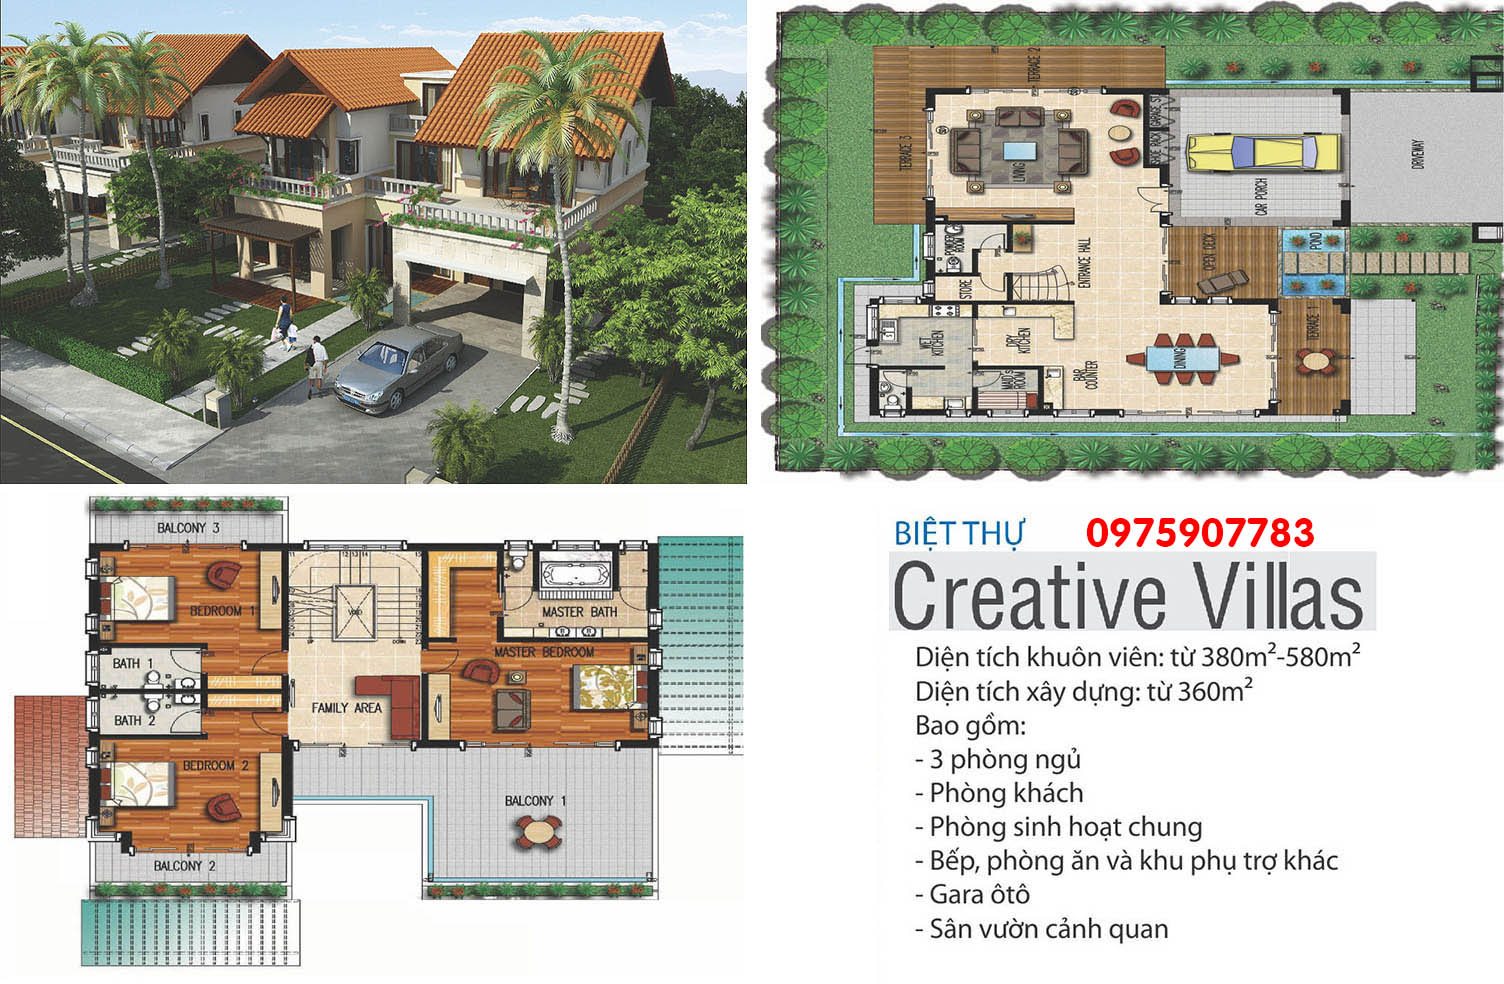 Xanh Villas - biệt thự Creative